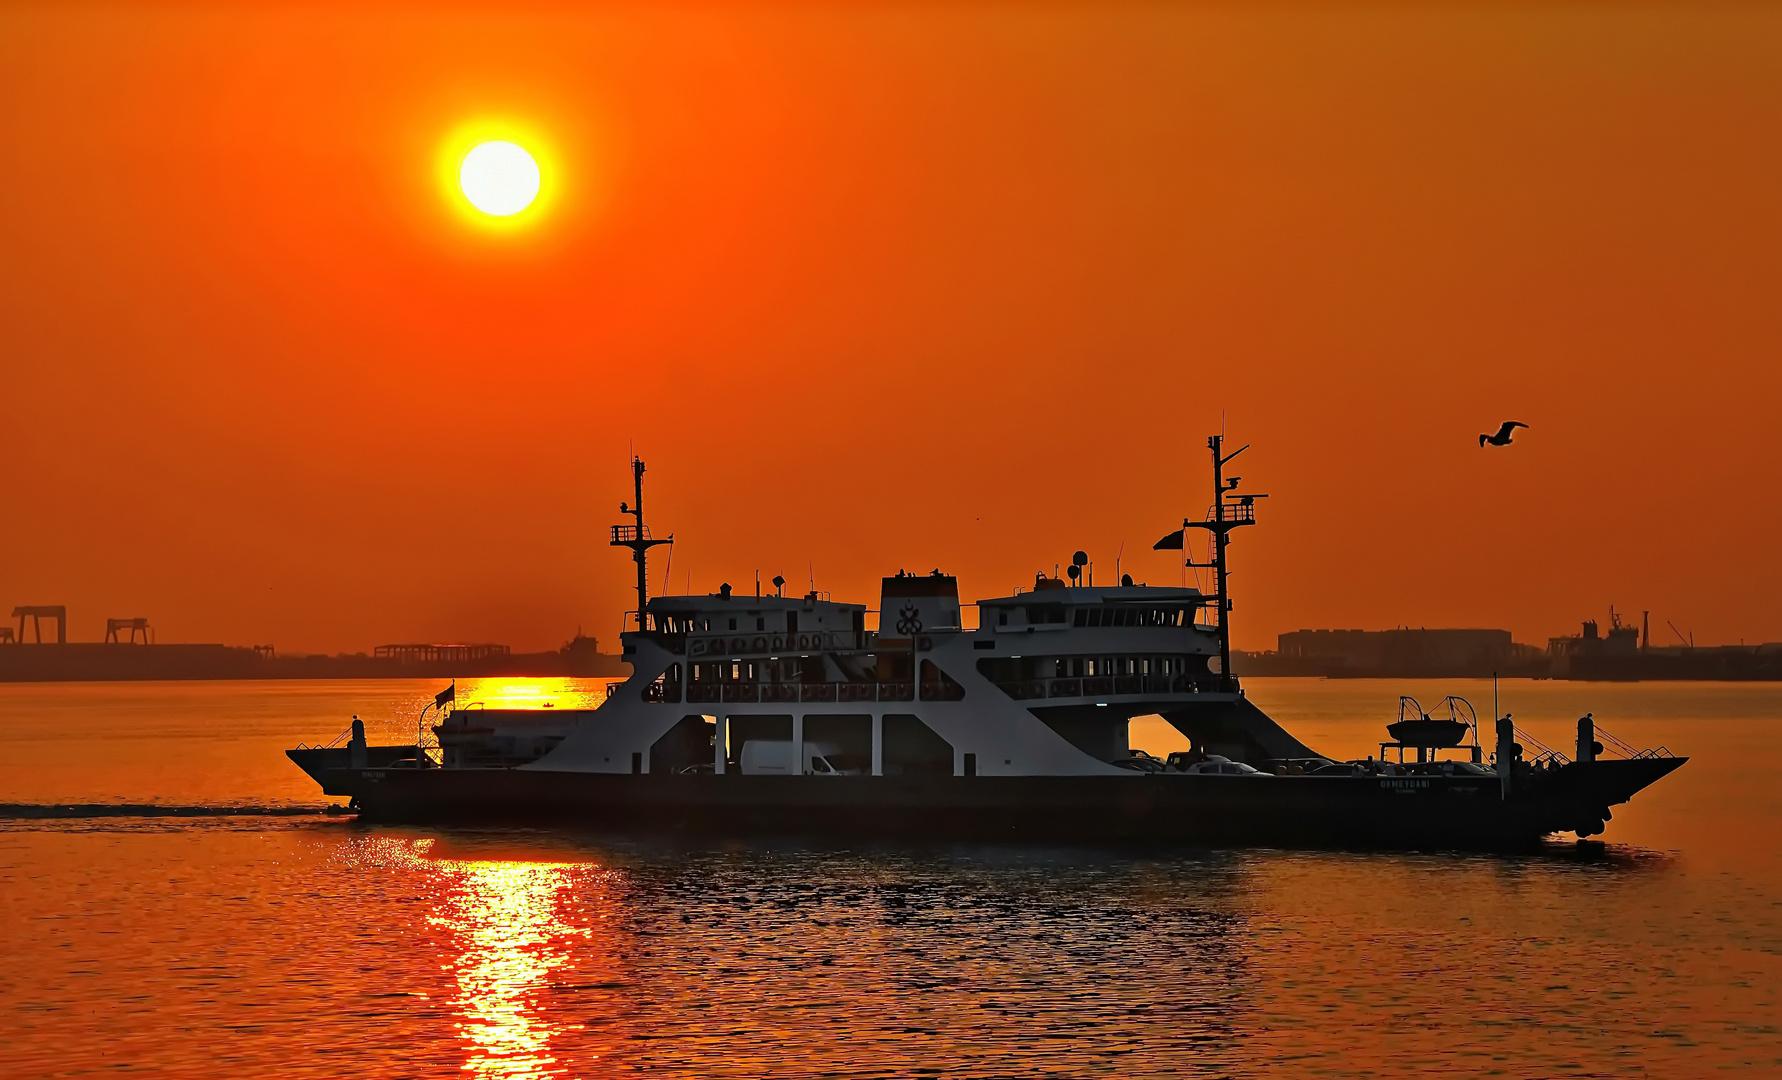 Sonnenuntergang - Gebze Türkei -